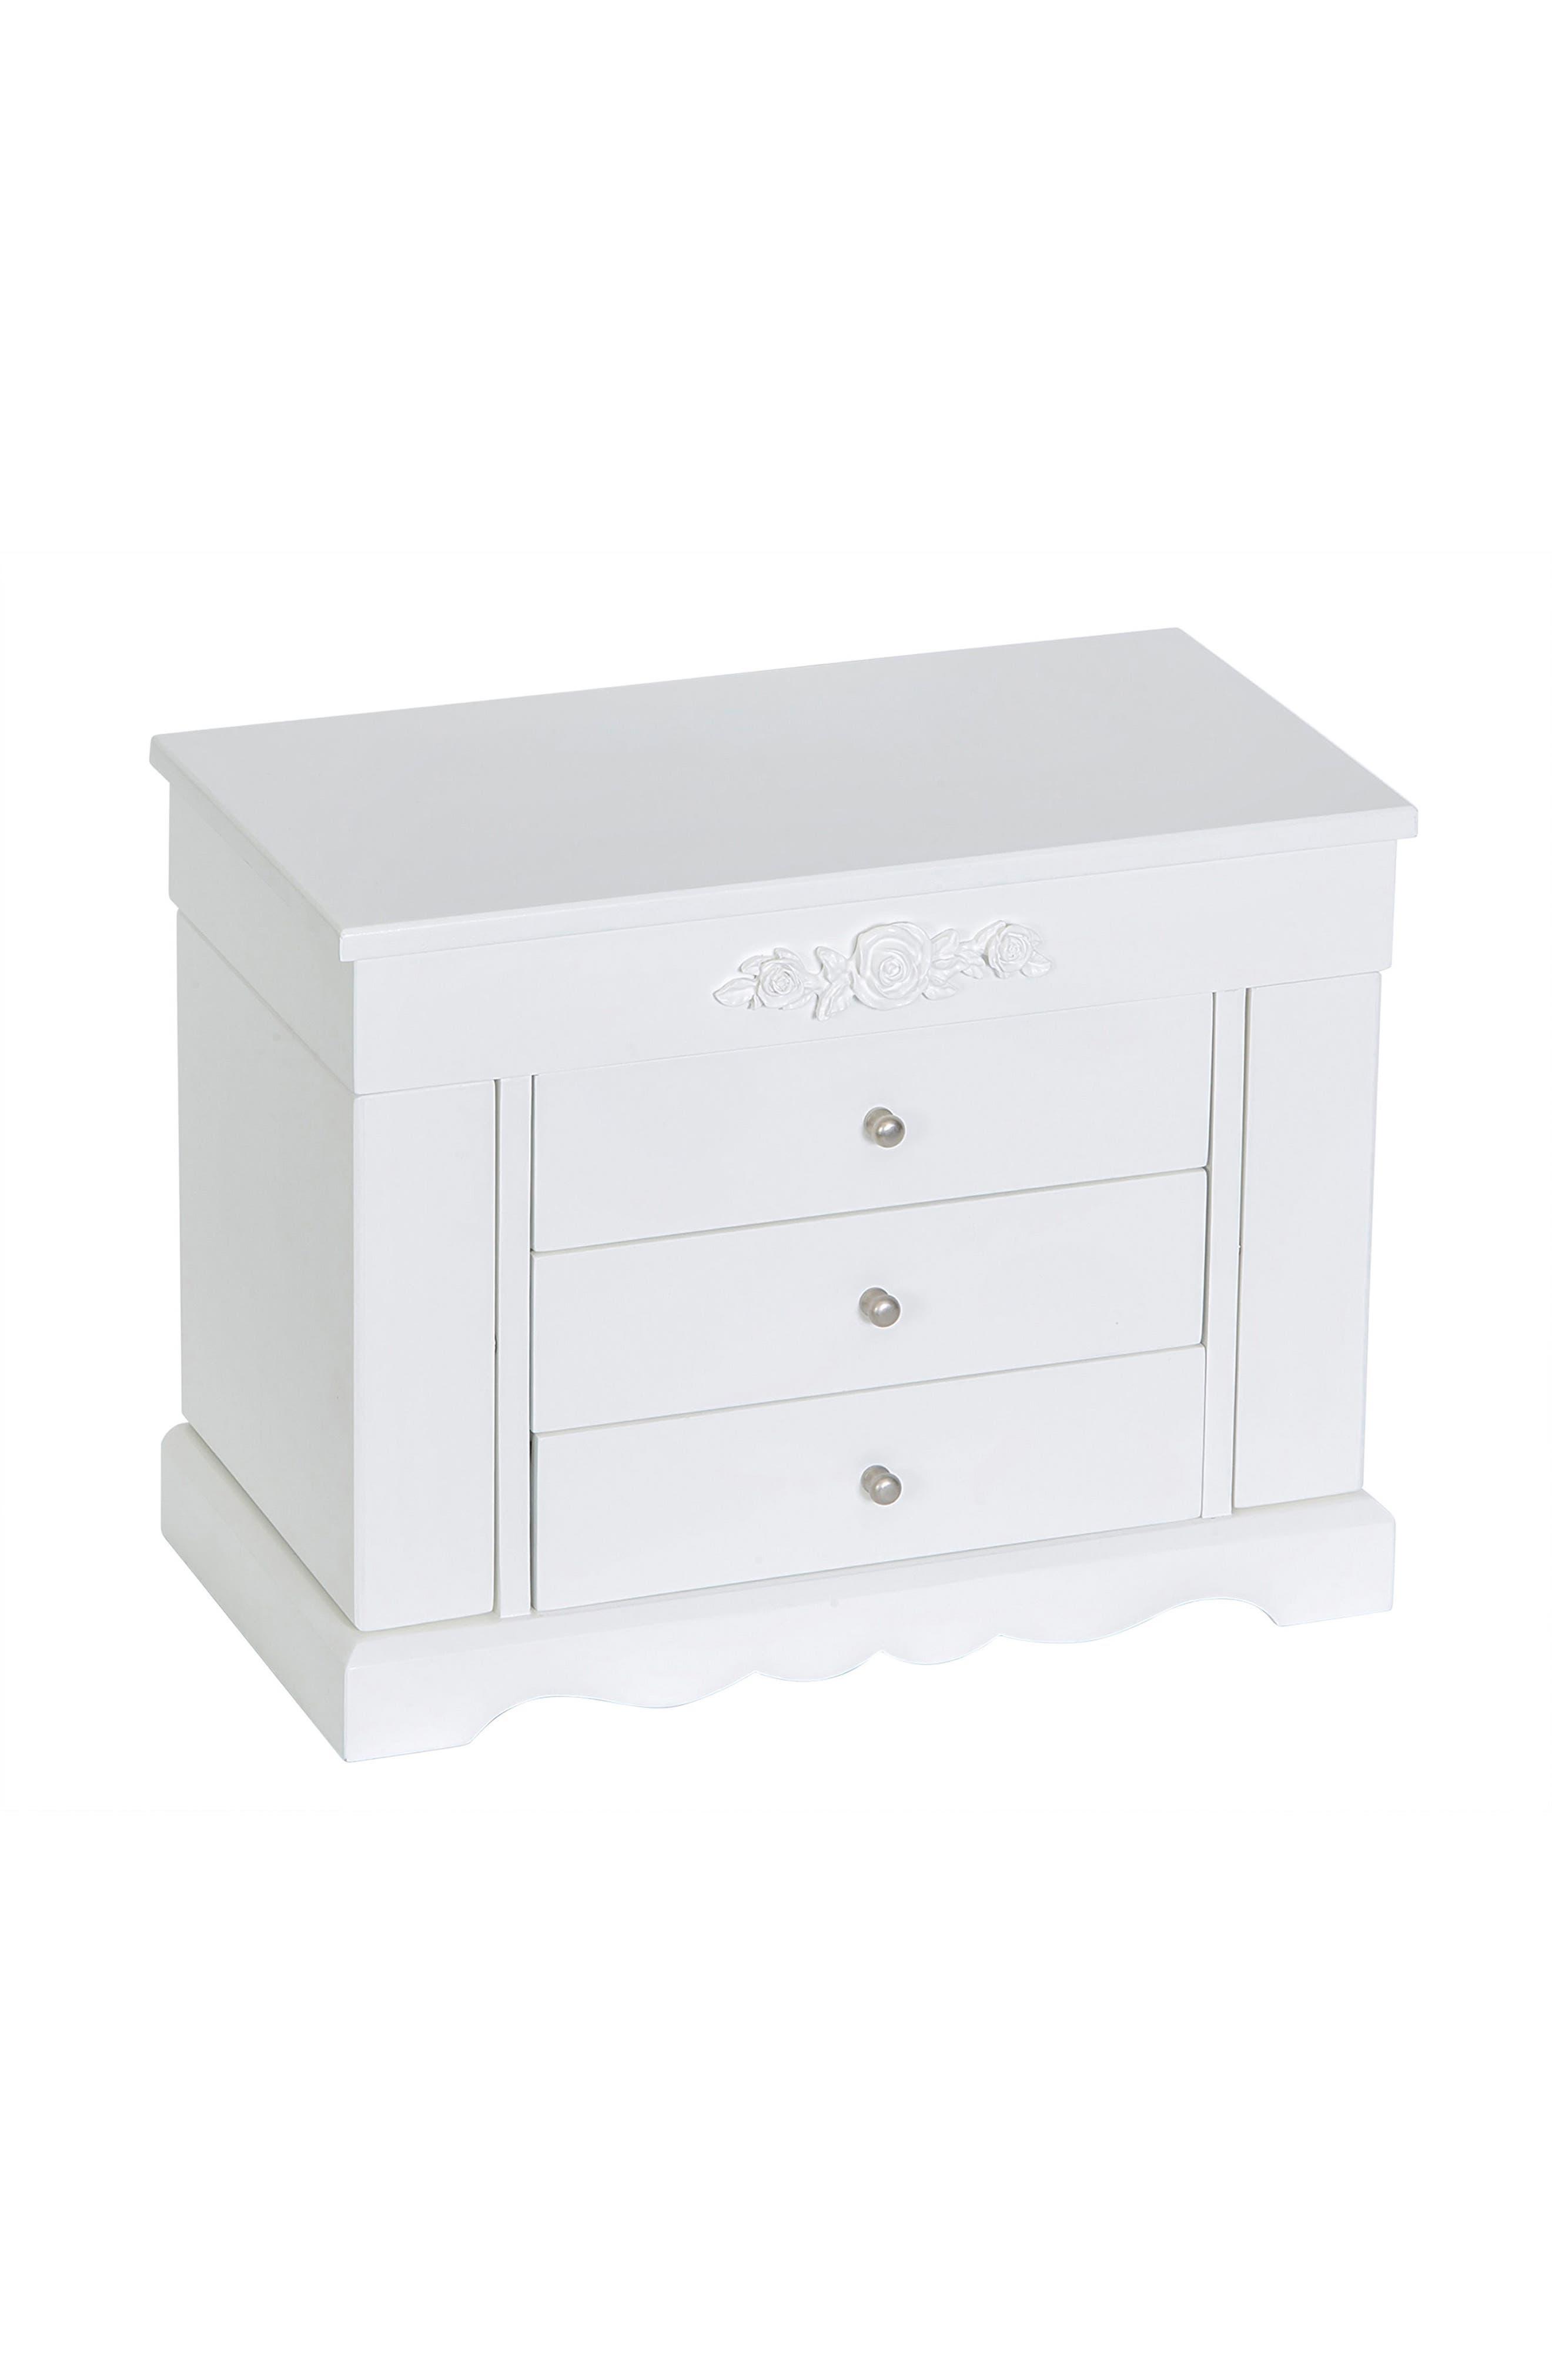 Main Image - Mele & Co. Montague Jewelry Box